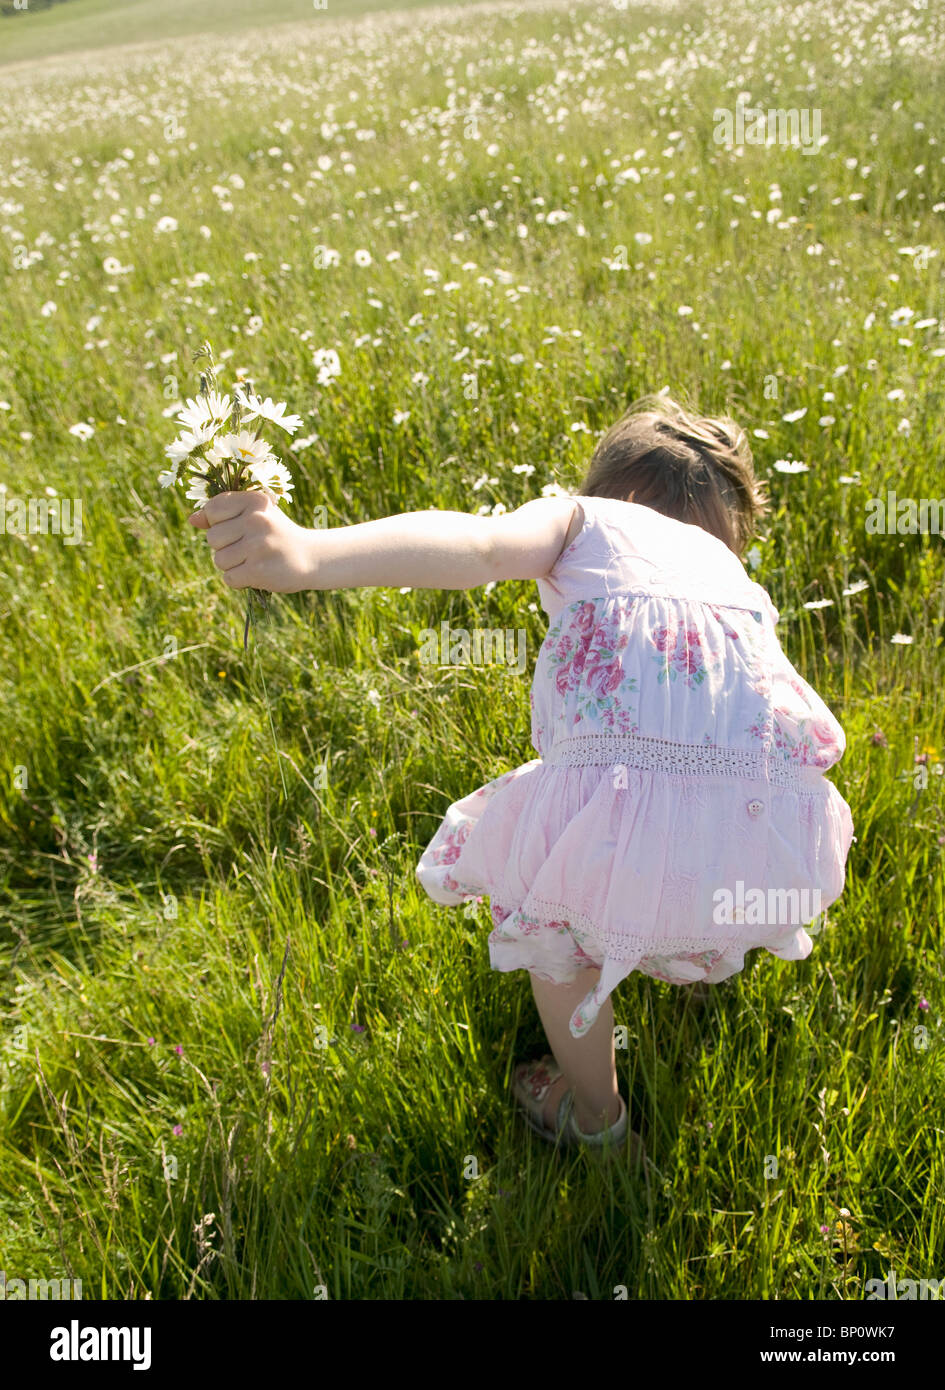 Girl picks wild flowers in meadow - Stock Image